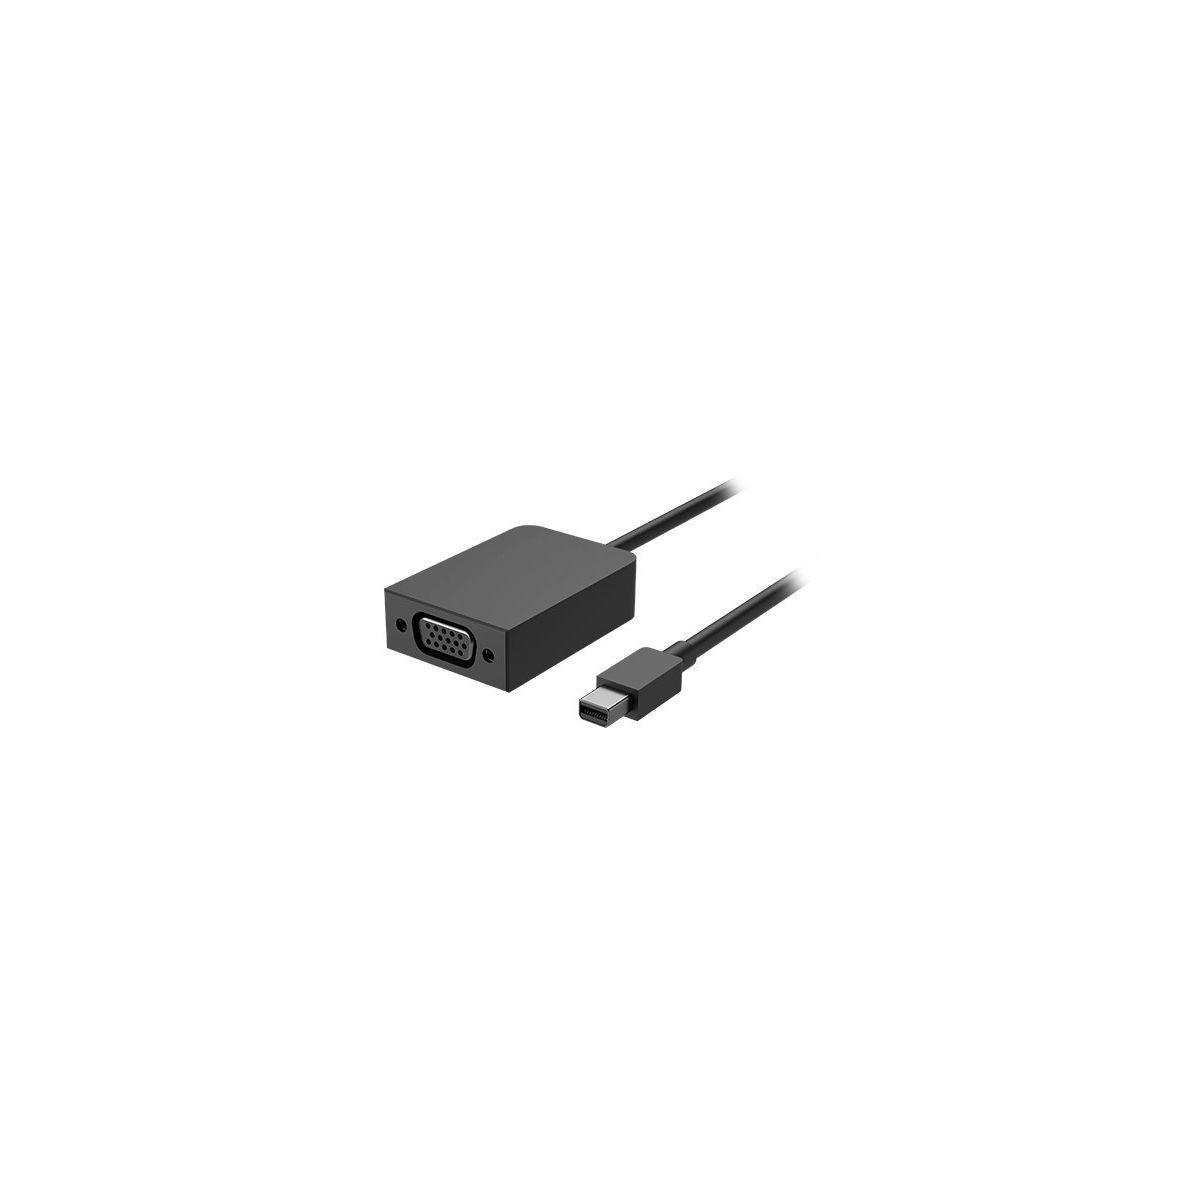 Adaptateur microsoft mini displayport vg - livraison offerte : code liv (photo)